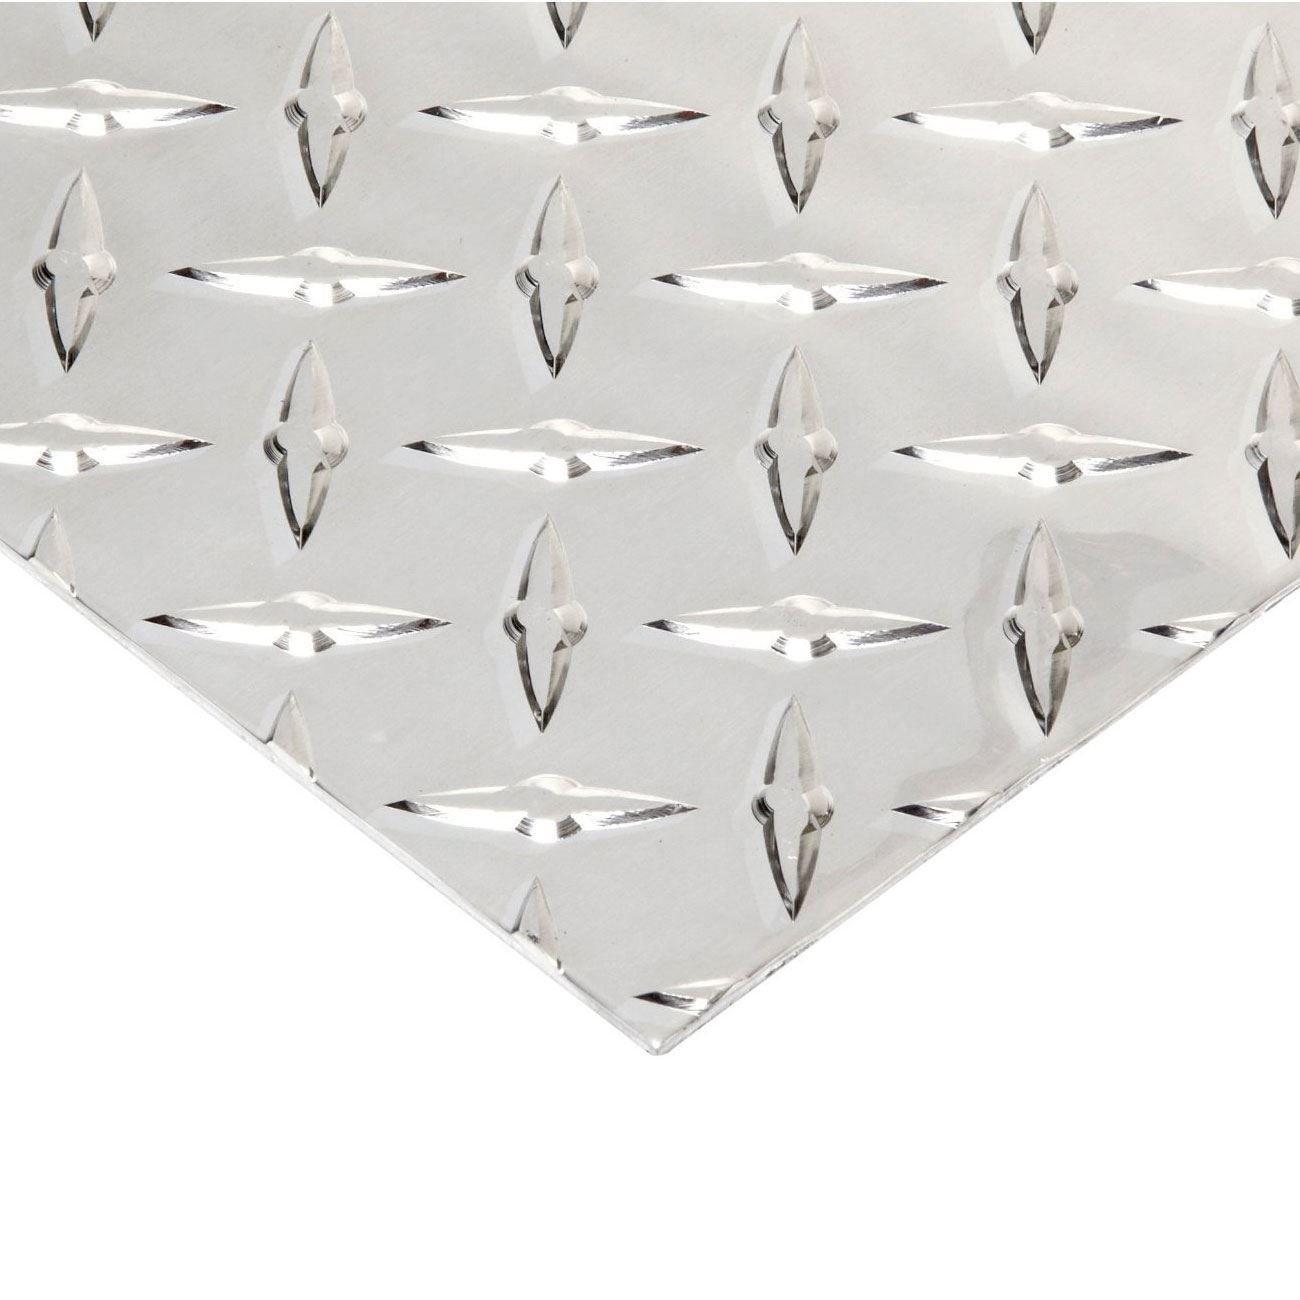 Online Metal Supply Aluminum Diamond Tread Plate 0.080'' x 12'' x 48'' by Online Metal Supply